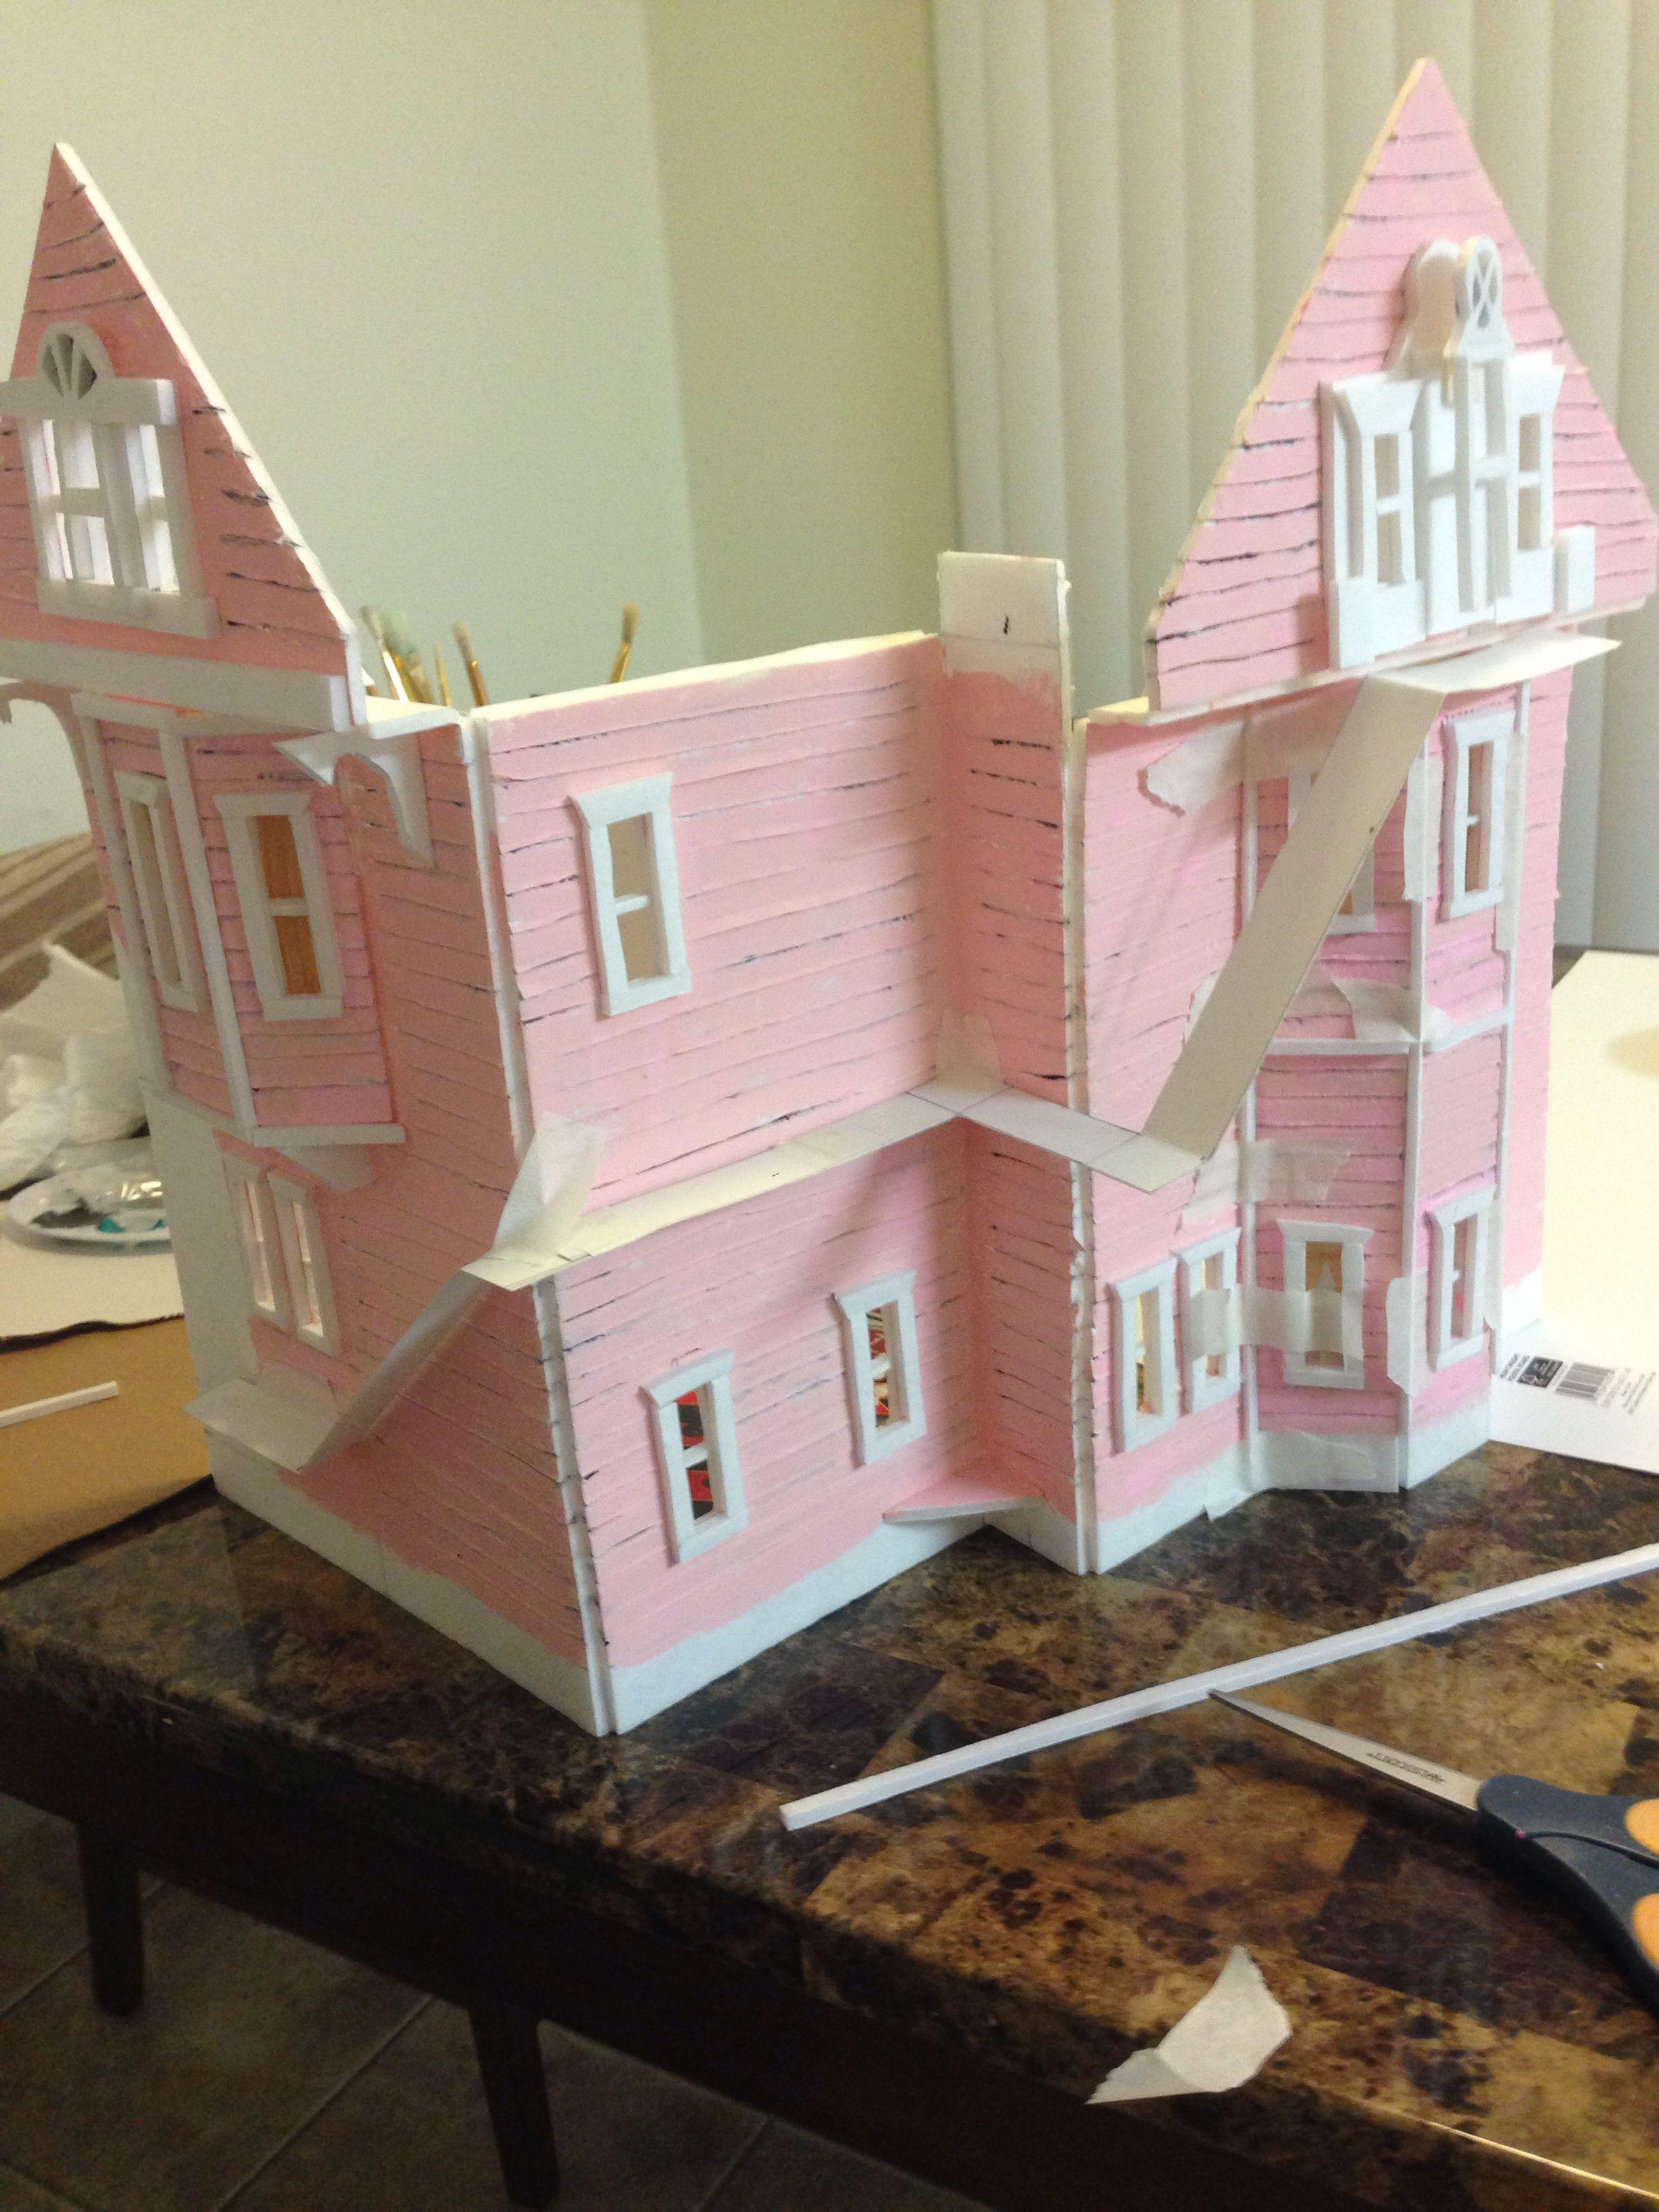 Coraline Pink Palace Apartments Tim Burton Coraline Cores Palacio